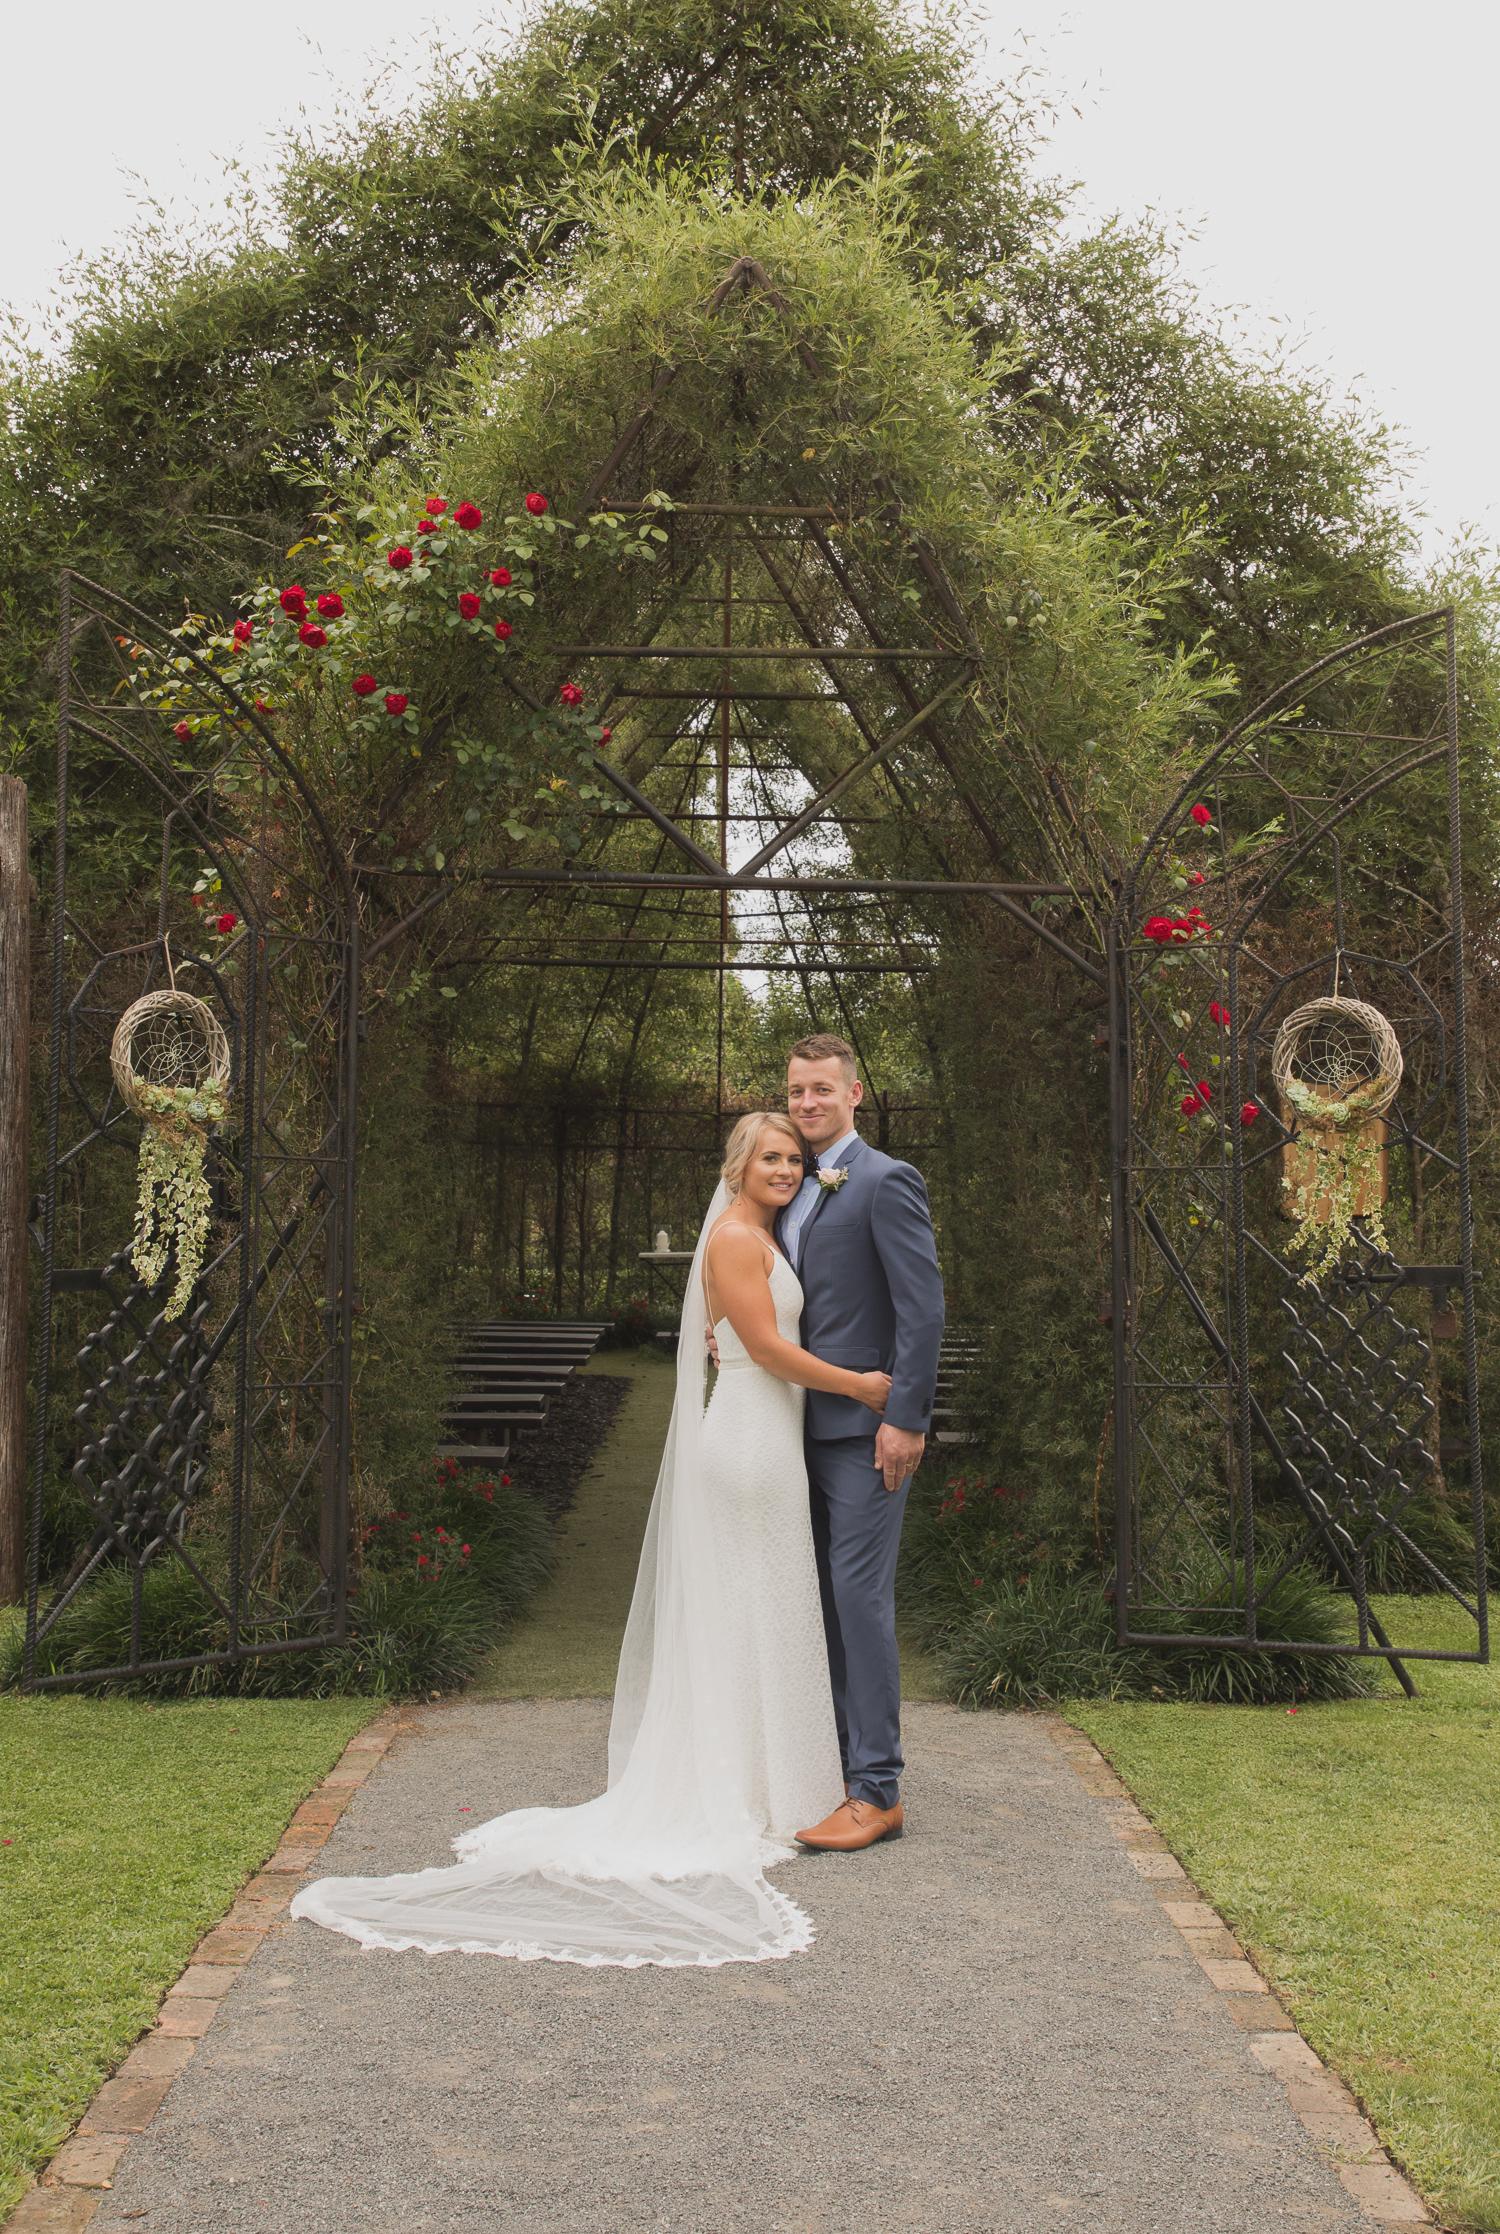 bride and groom at Ohaupo Tree Church wedding